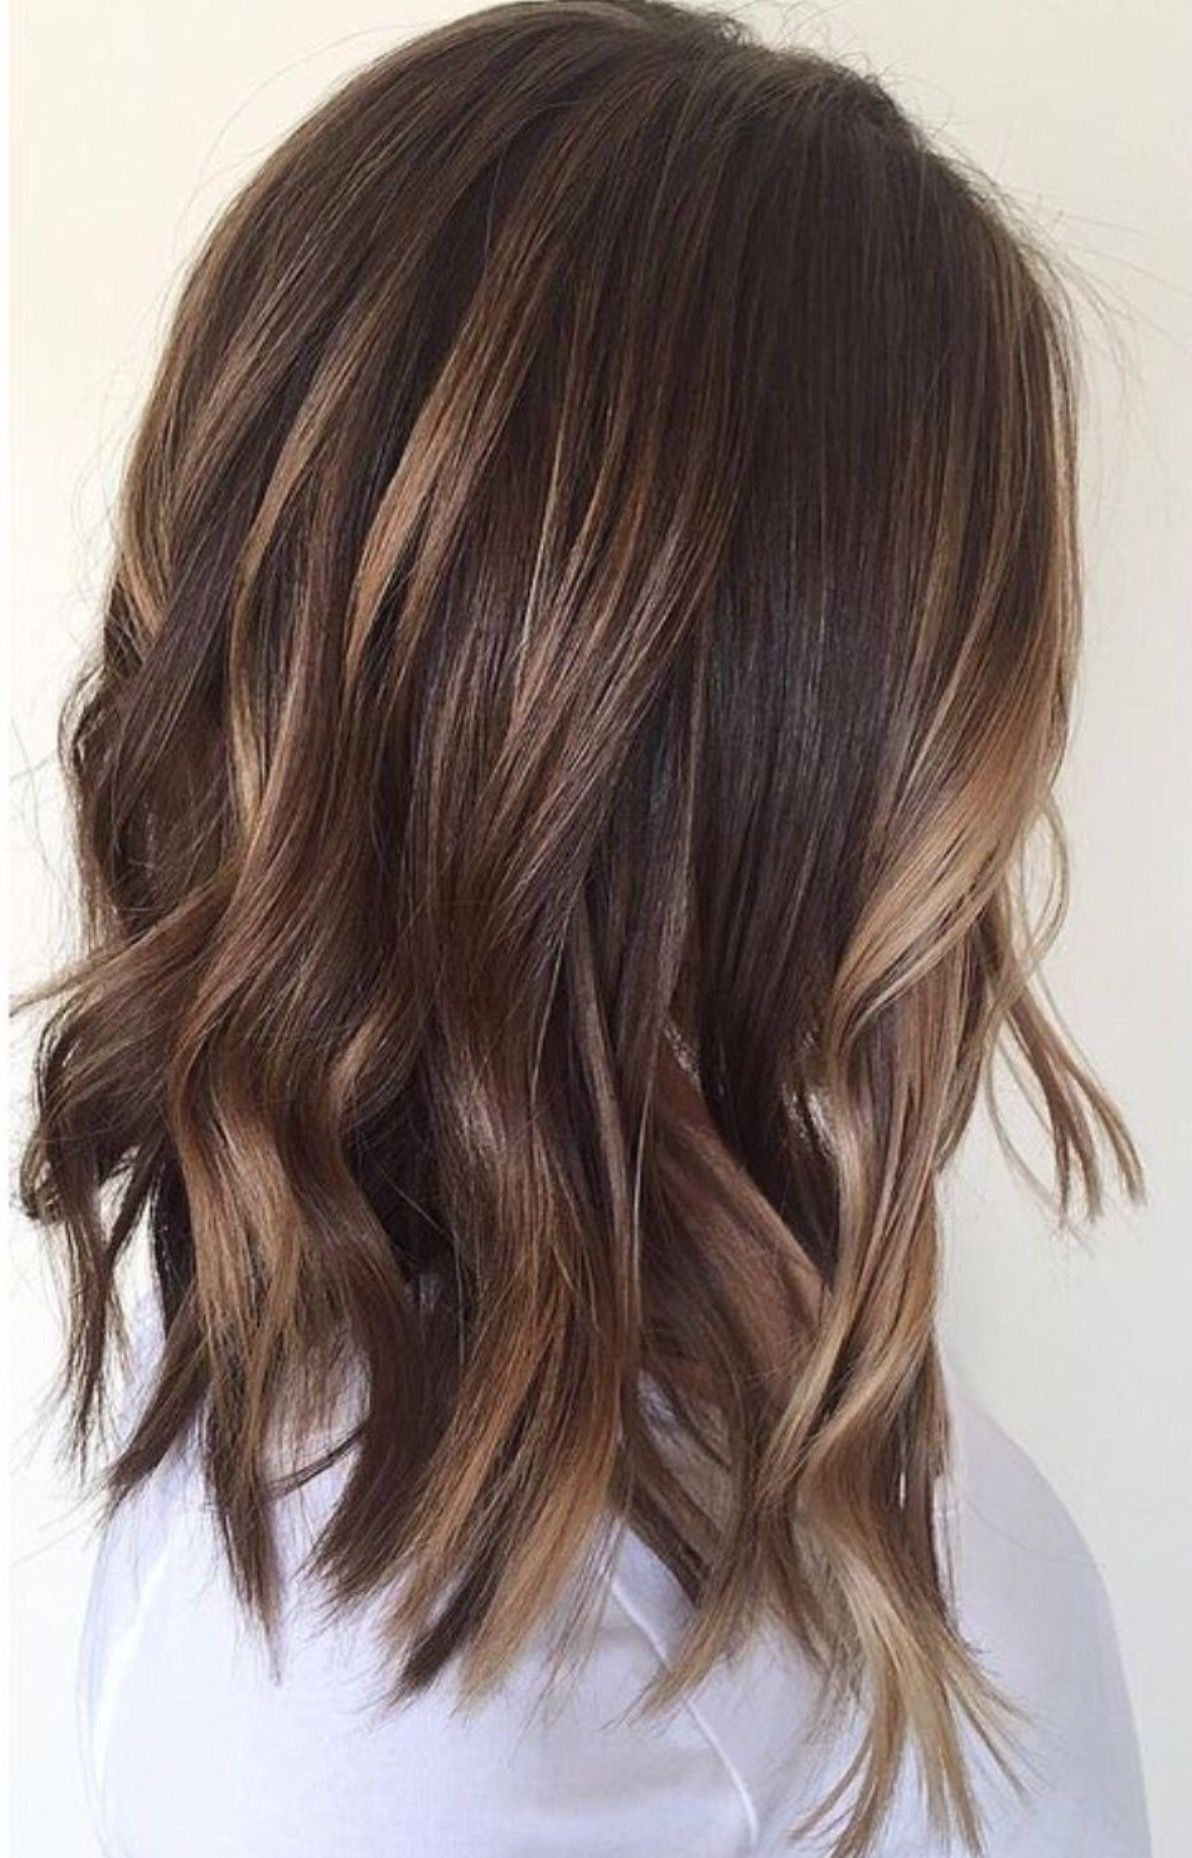 Glossy Brown And Balayage Mid Length Lob Shoulder Length Hair Hair Styles Hair Lengths Short Hair Lengths